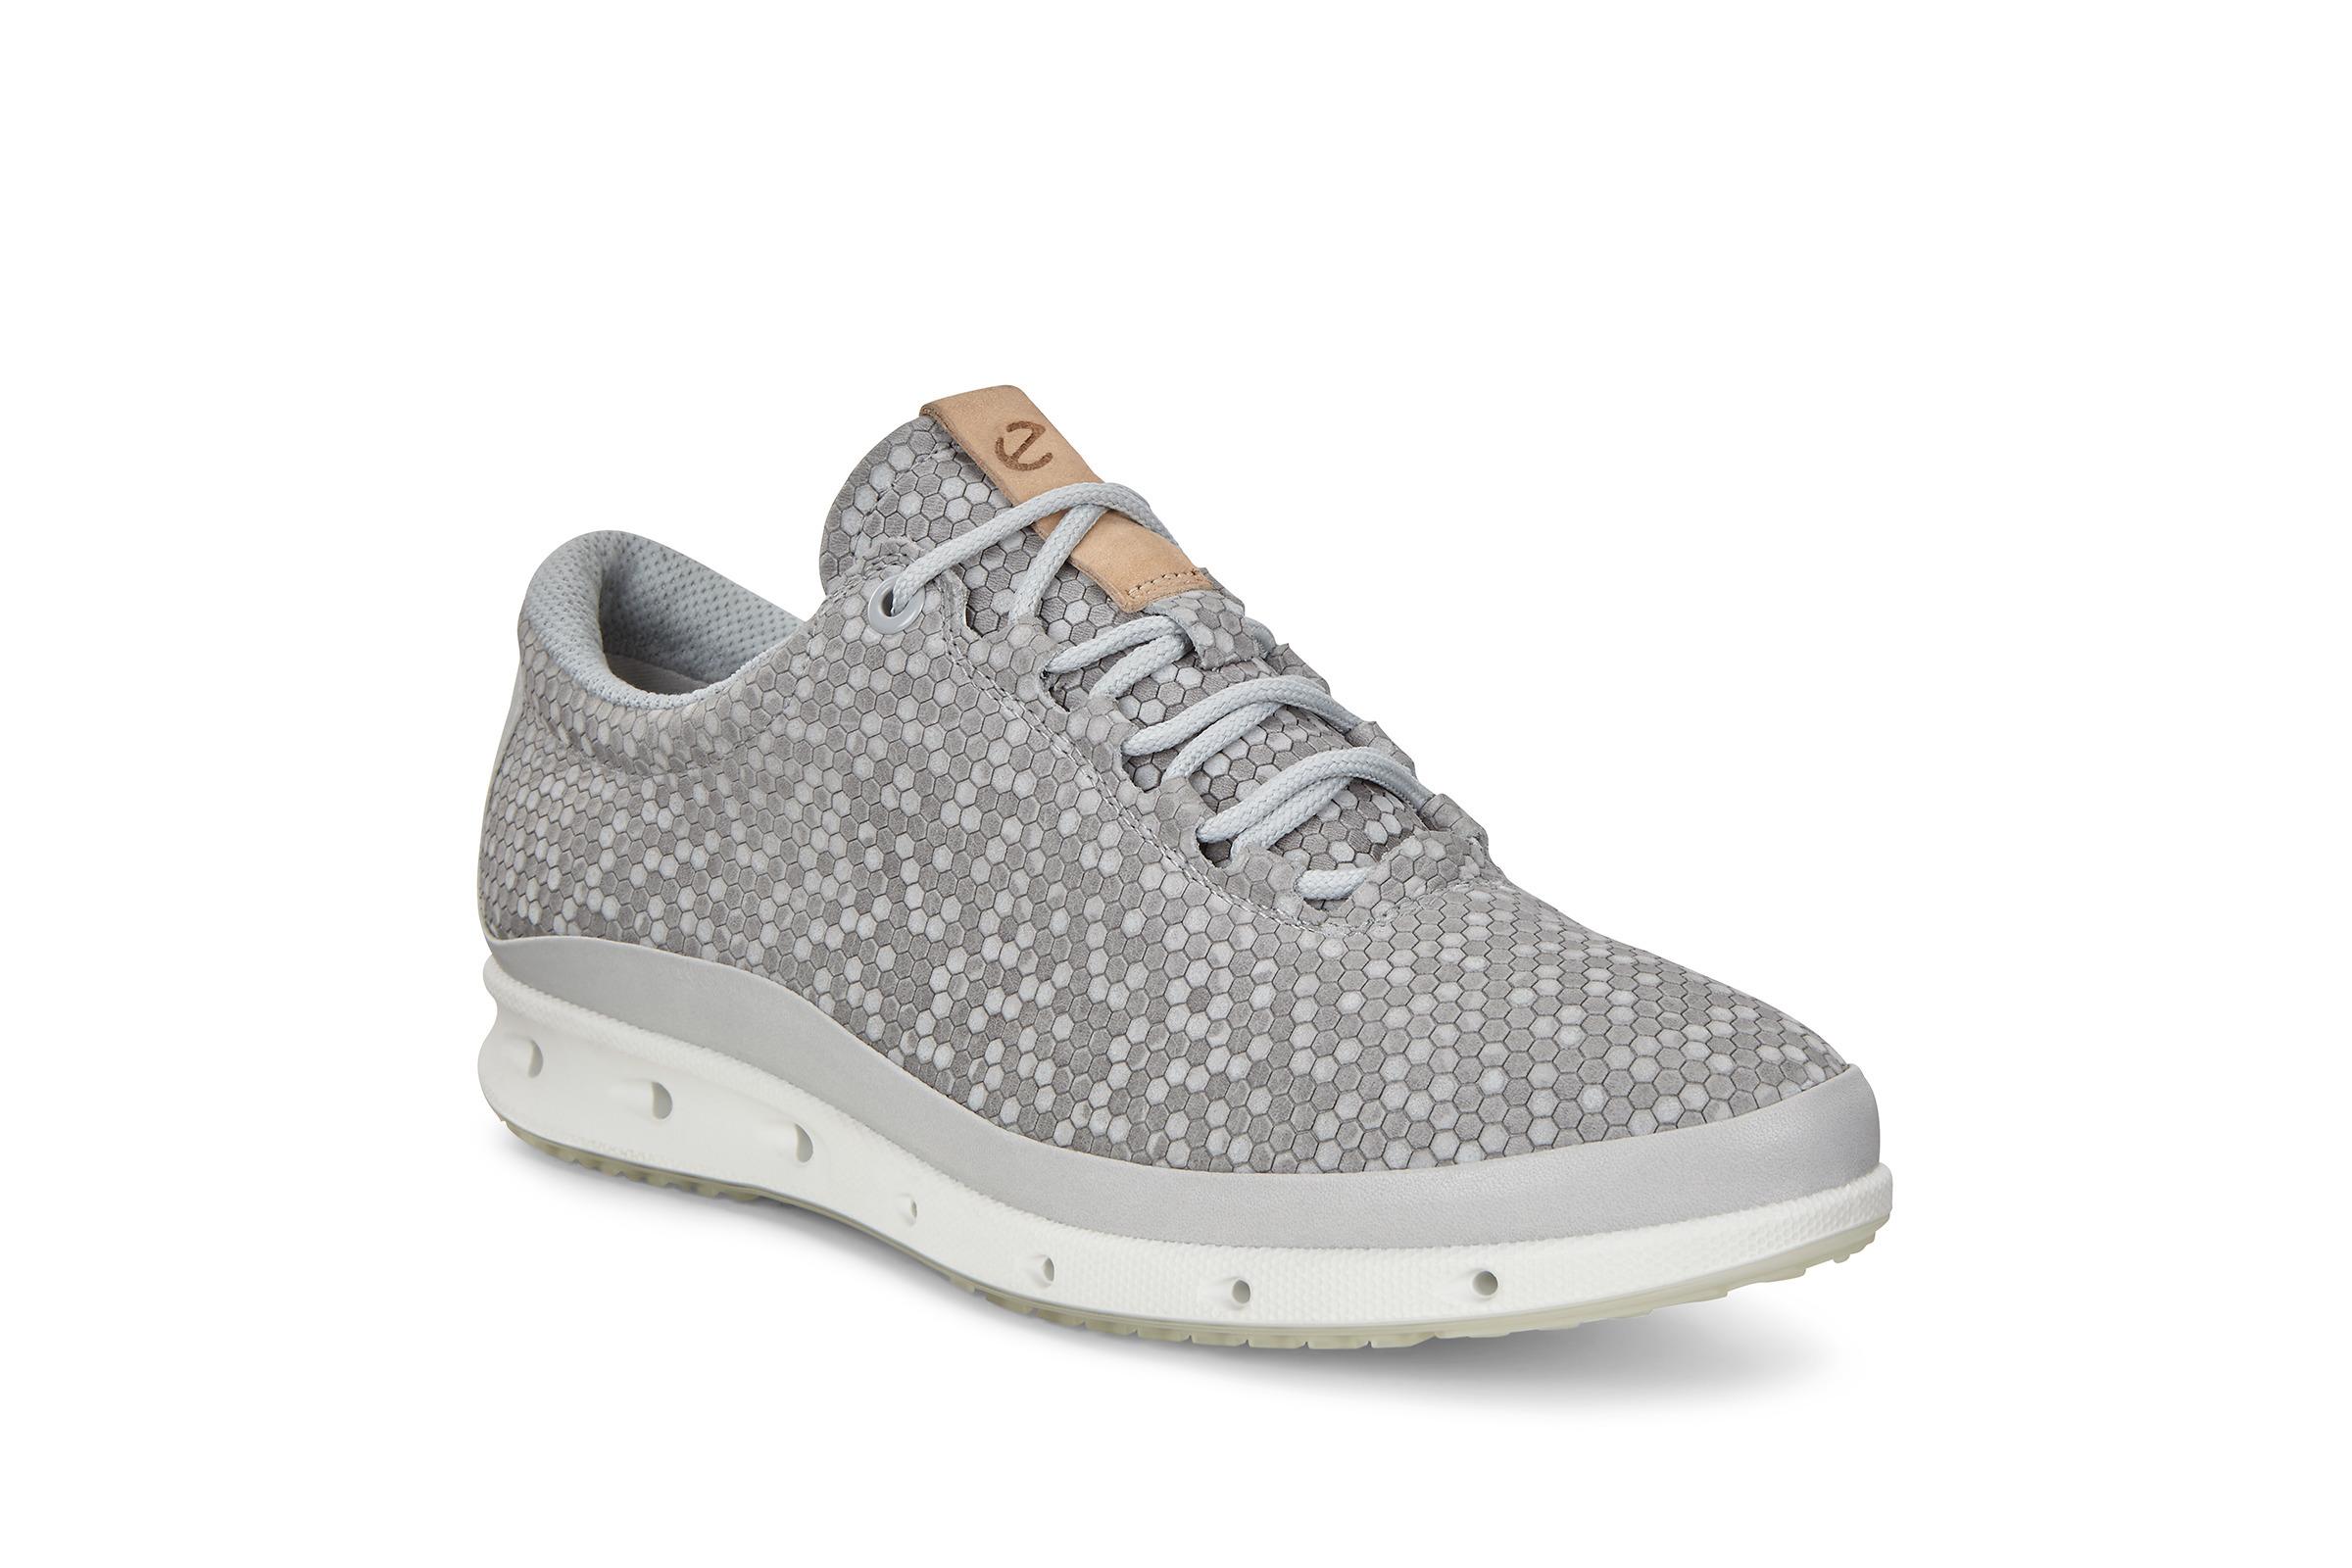 Einkaufen Offiziellen Schuhe Shop Im Ecco® Damen xdX7EqE